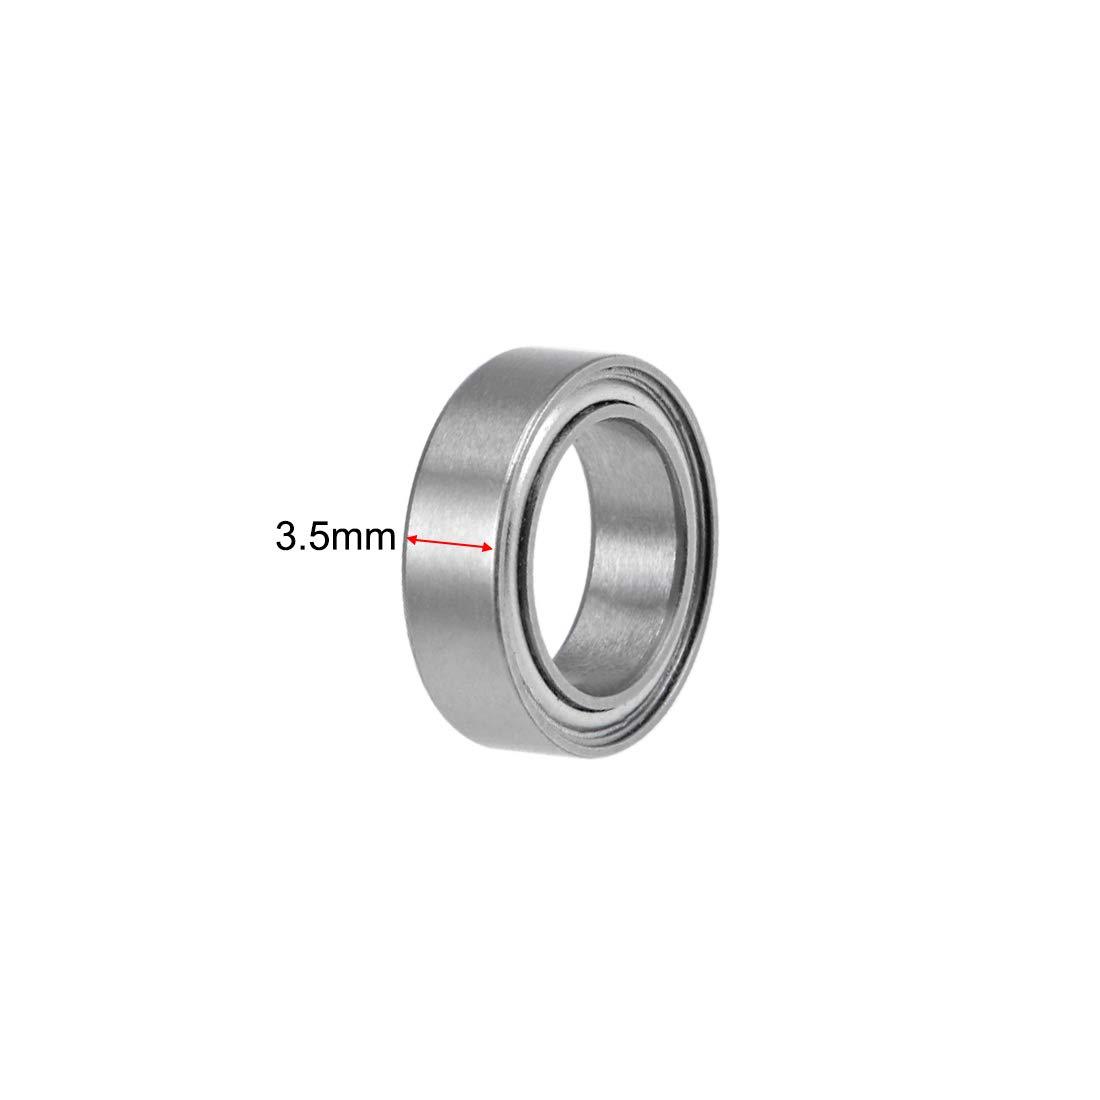 uxcell MR128ZZ Deep Groove Ball Bearings 8mm Inner Dia 12mm OD 3.5mm Bore Double Shielded Chrome Steel Z2 2pcs